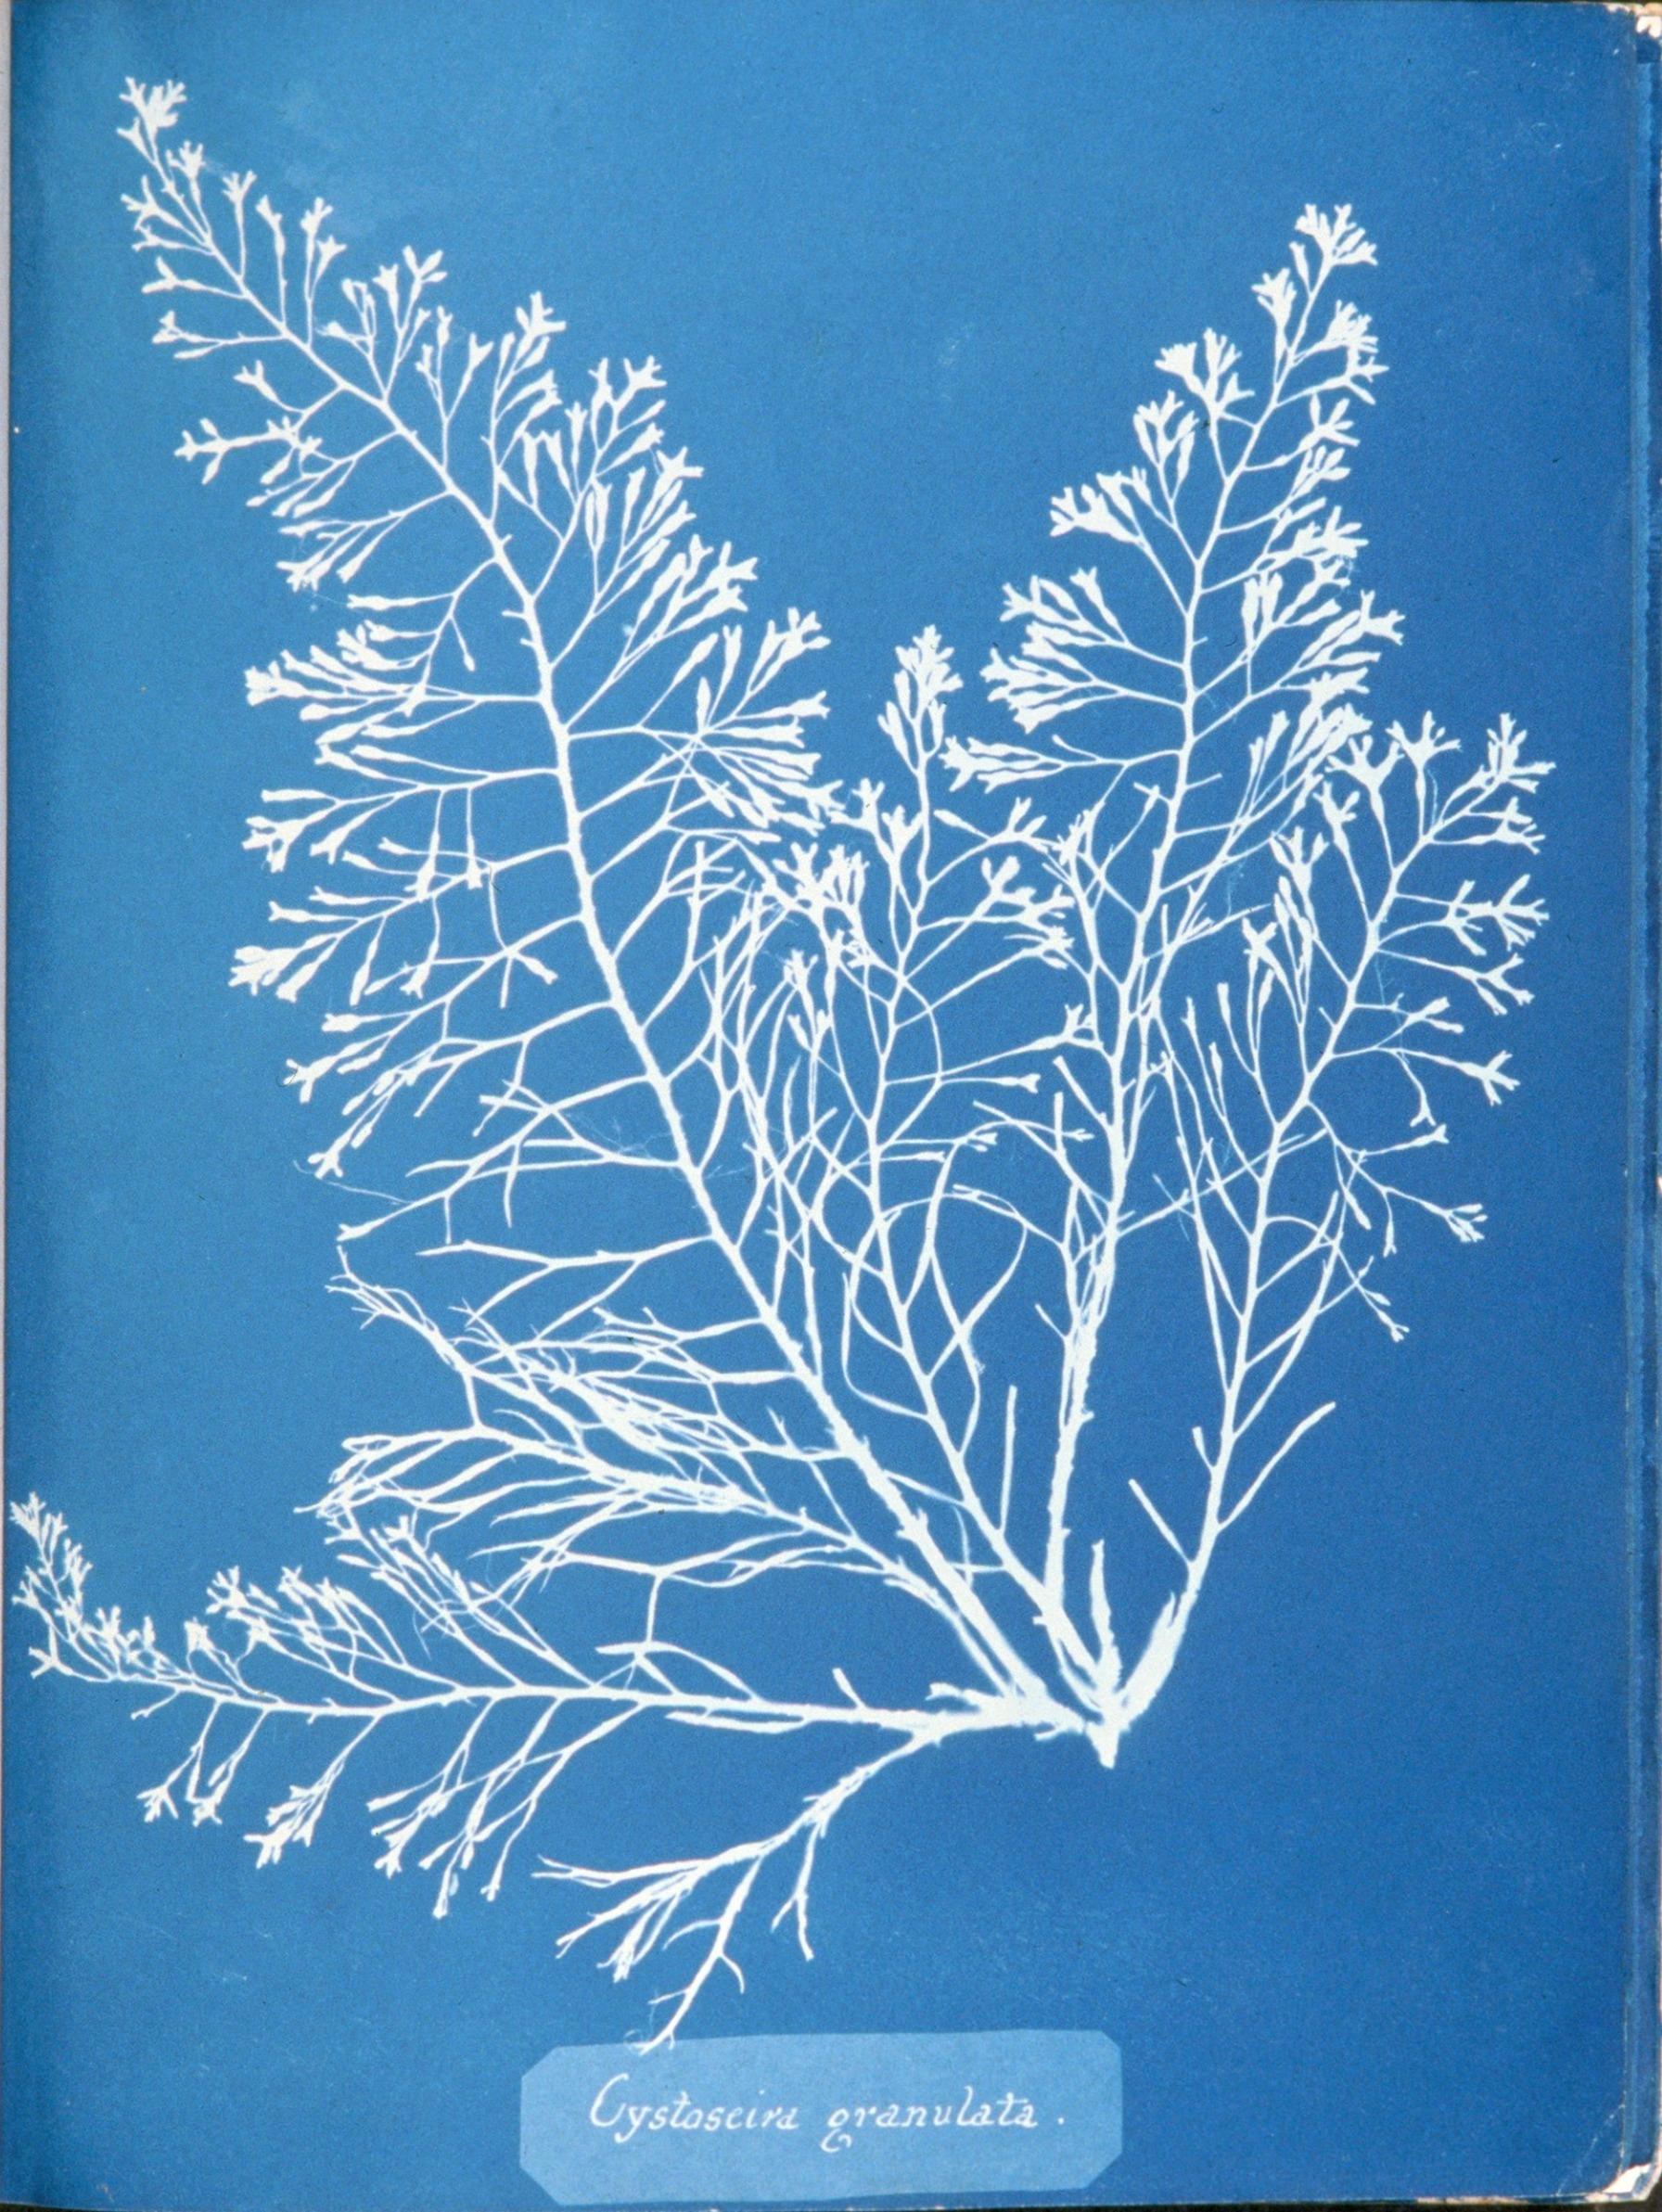 File:Anna Atkins Cystoseira granulata.jpg - Wikimedia Commons